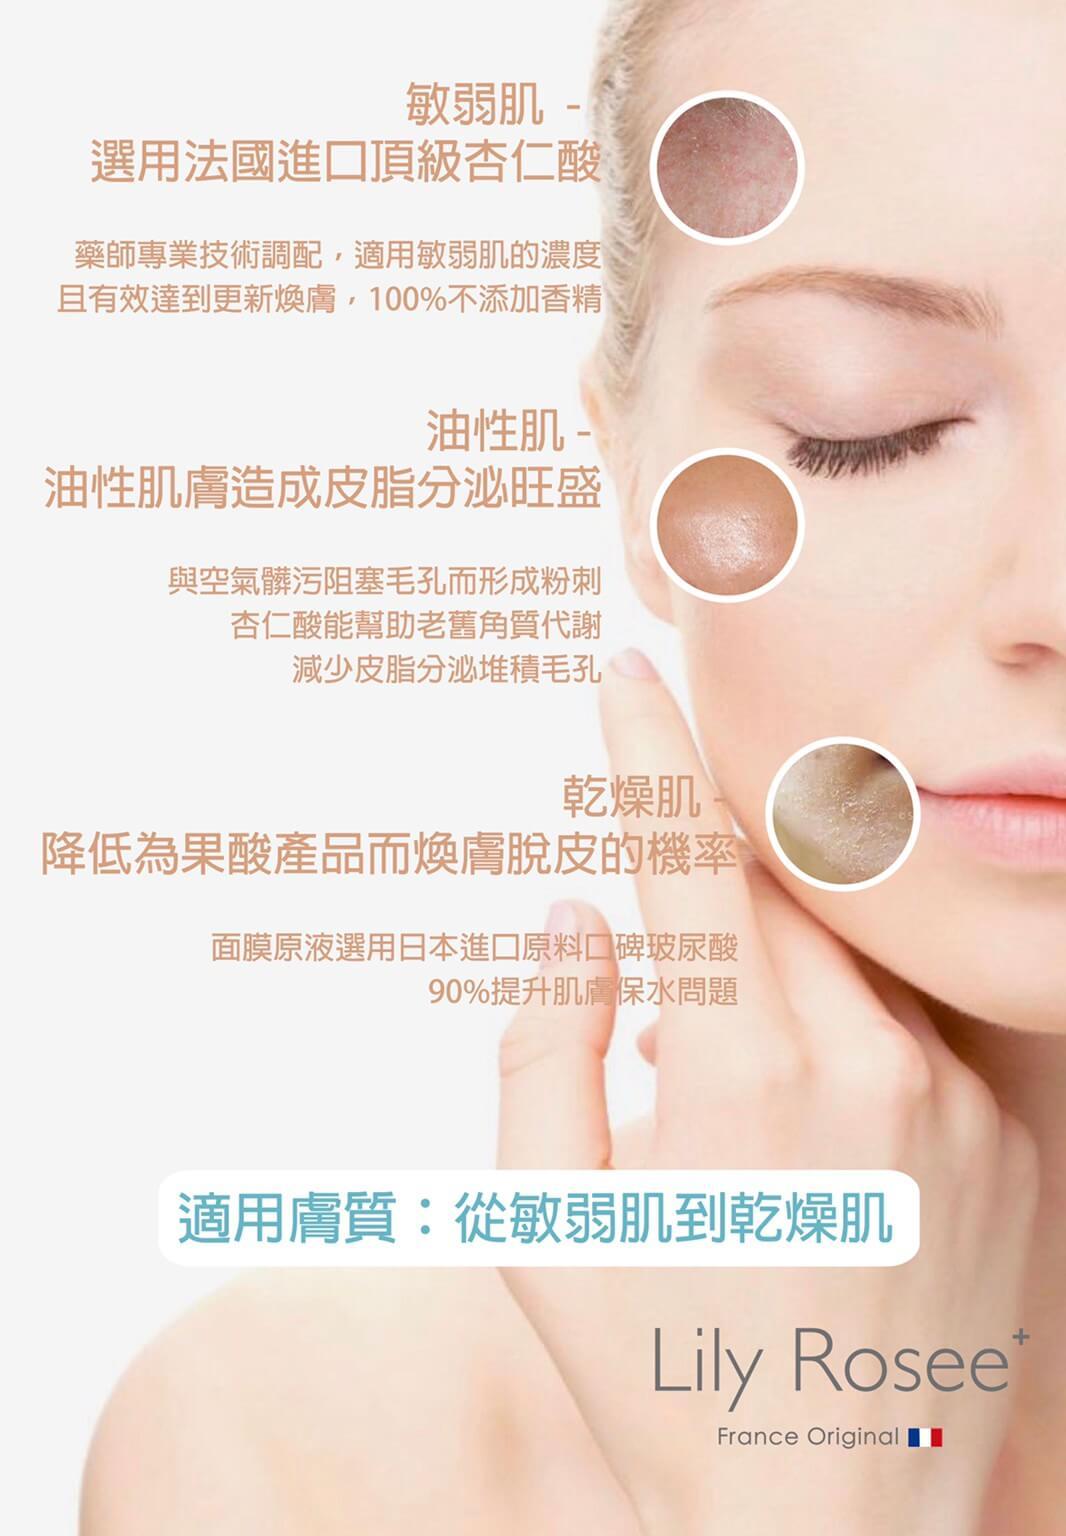 Lily Rosee杏仁酸面膜適用的肌膚類型